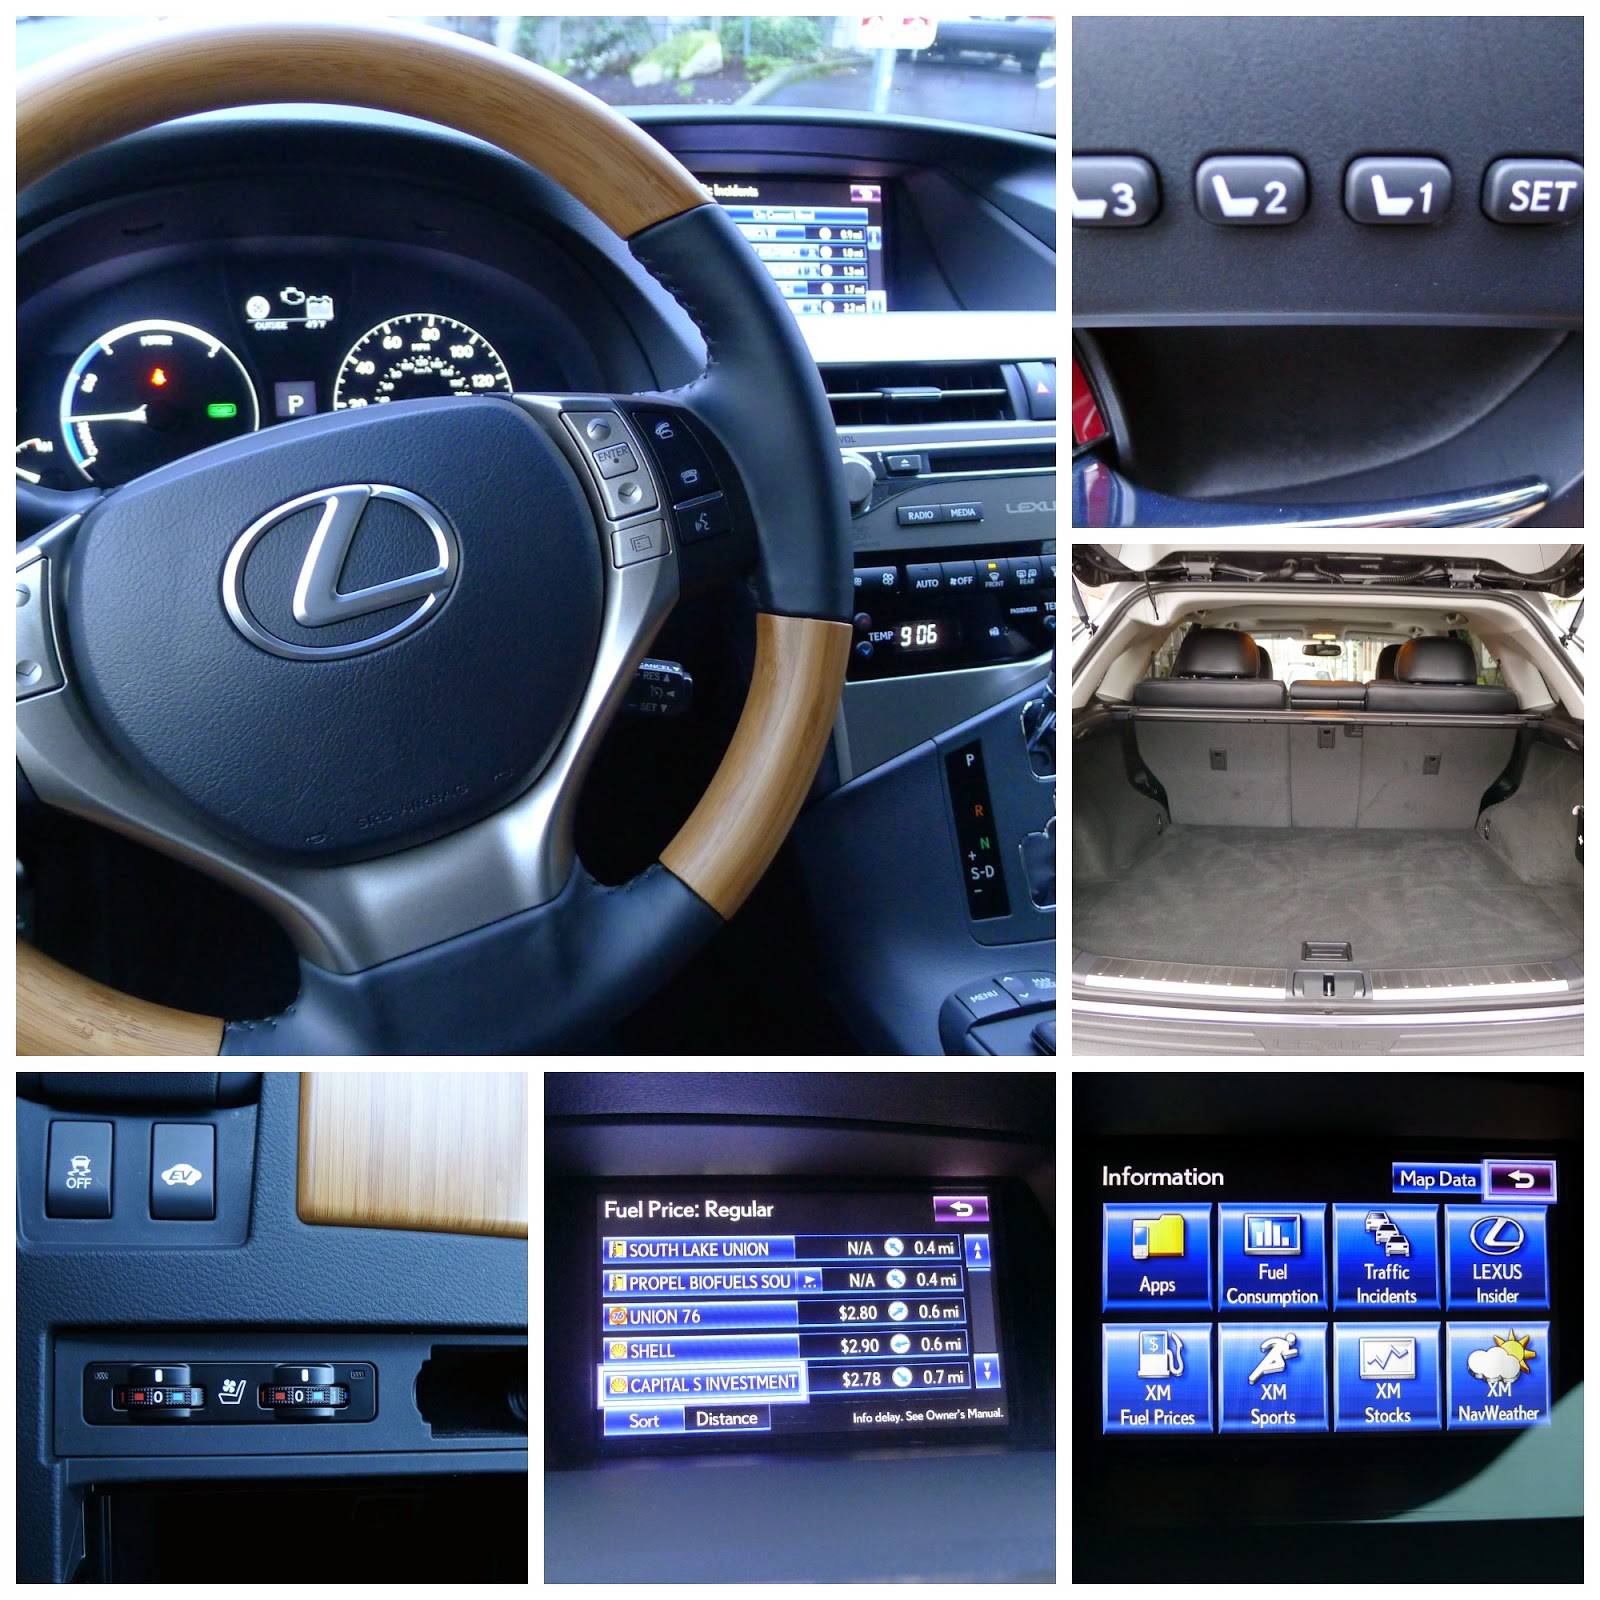 Lexus%2BRX%2B450h%2B2.jpg